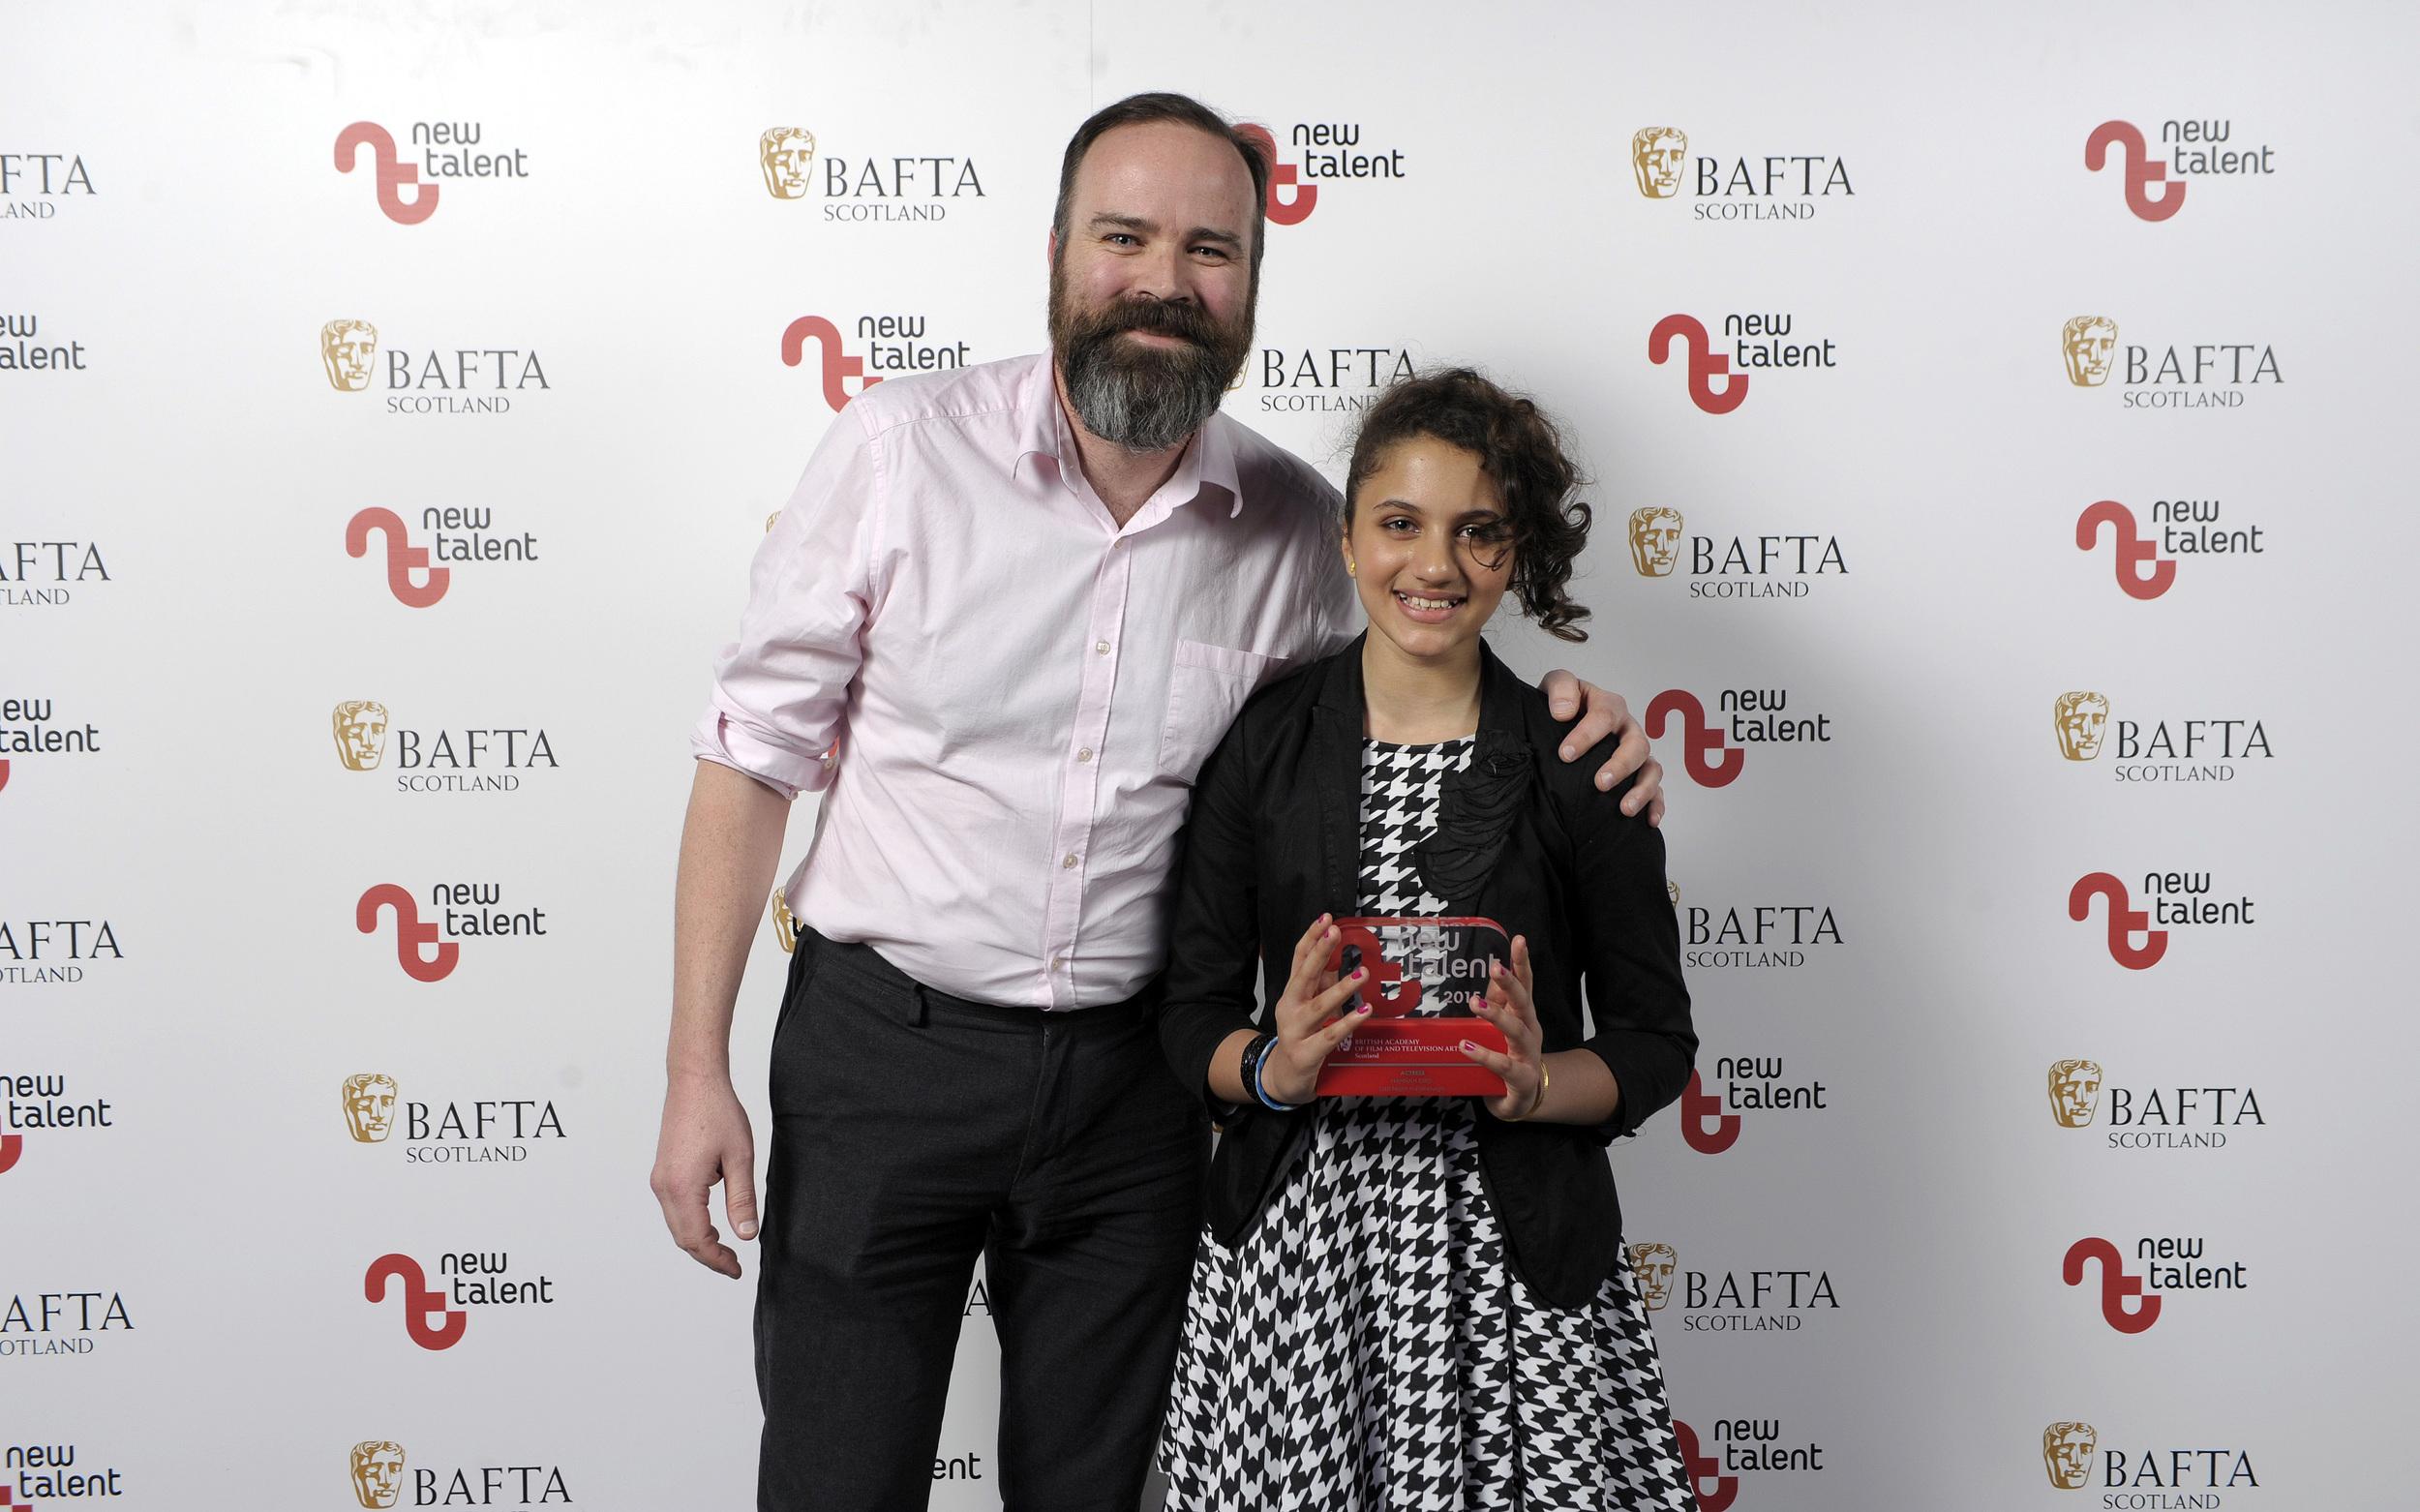 Hannah Ord Best Acress BAFTA New Talent Award 2015